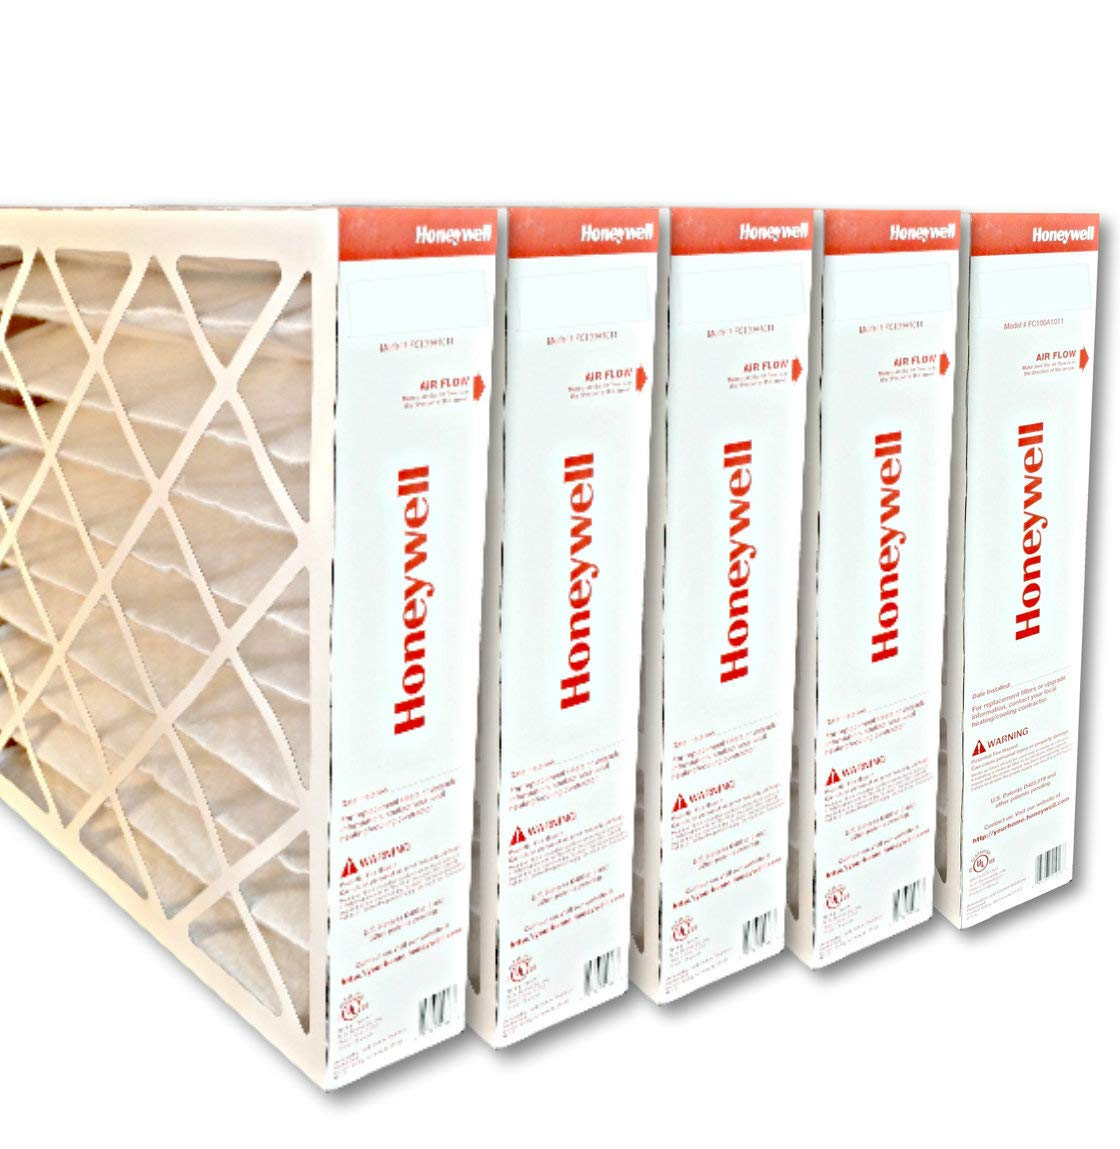 Honeywell FC100A1037 20''x25''x4'' Merv 11 Filter Media,(Packaging may vary) Pack of 5